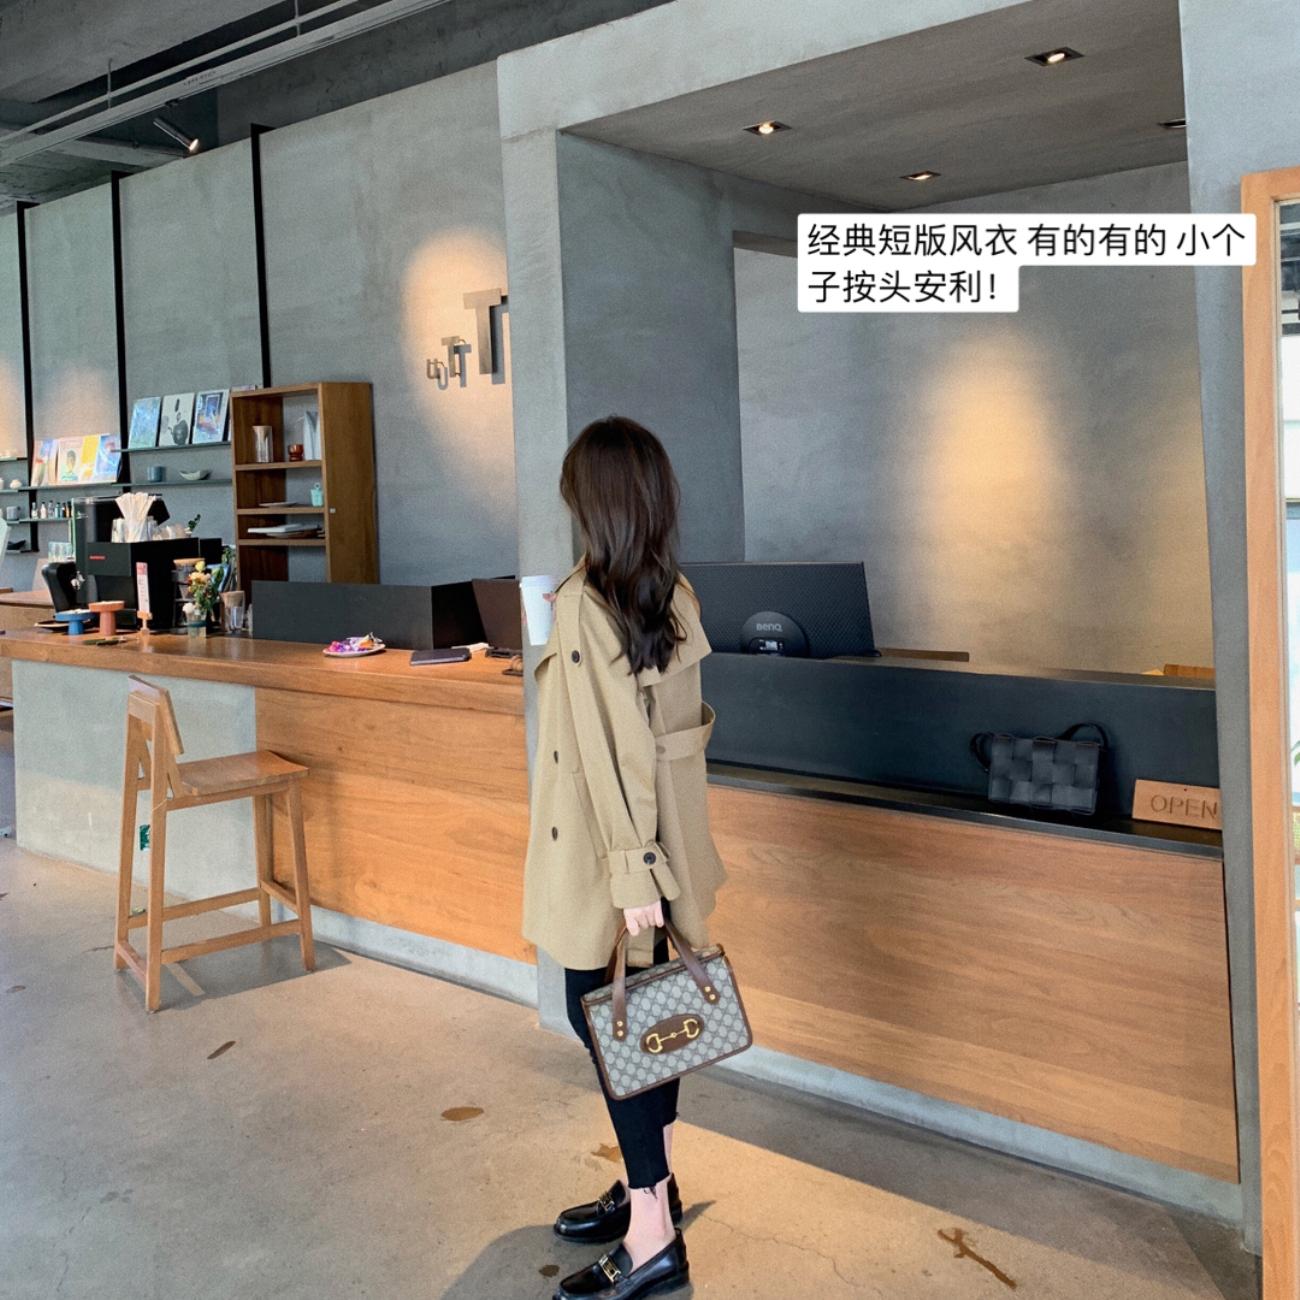 ASM ANNA◆8.26新品 剑桥纪念日~ 经典短款系带风衣-欧菲迪-